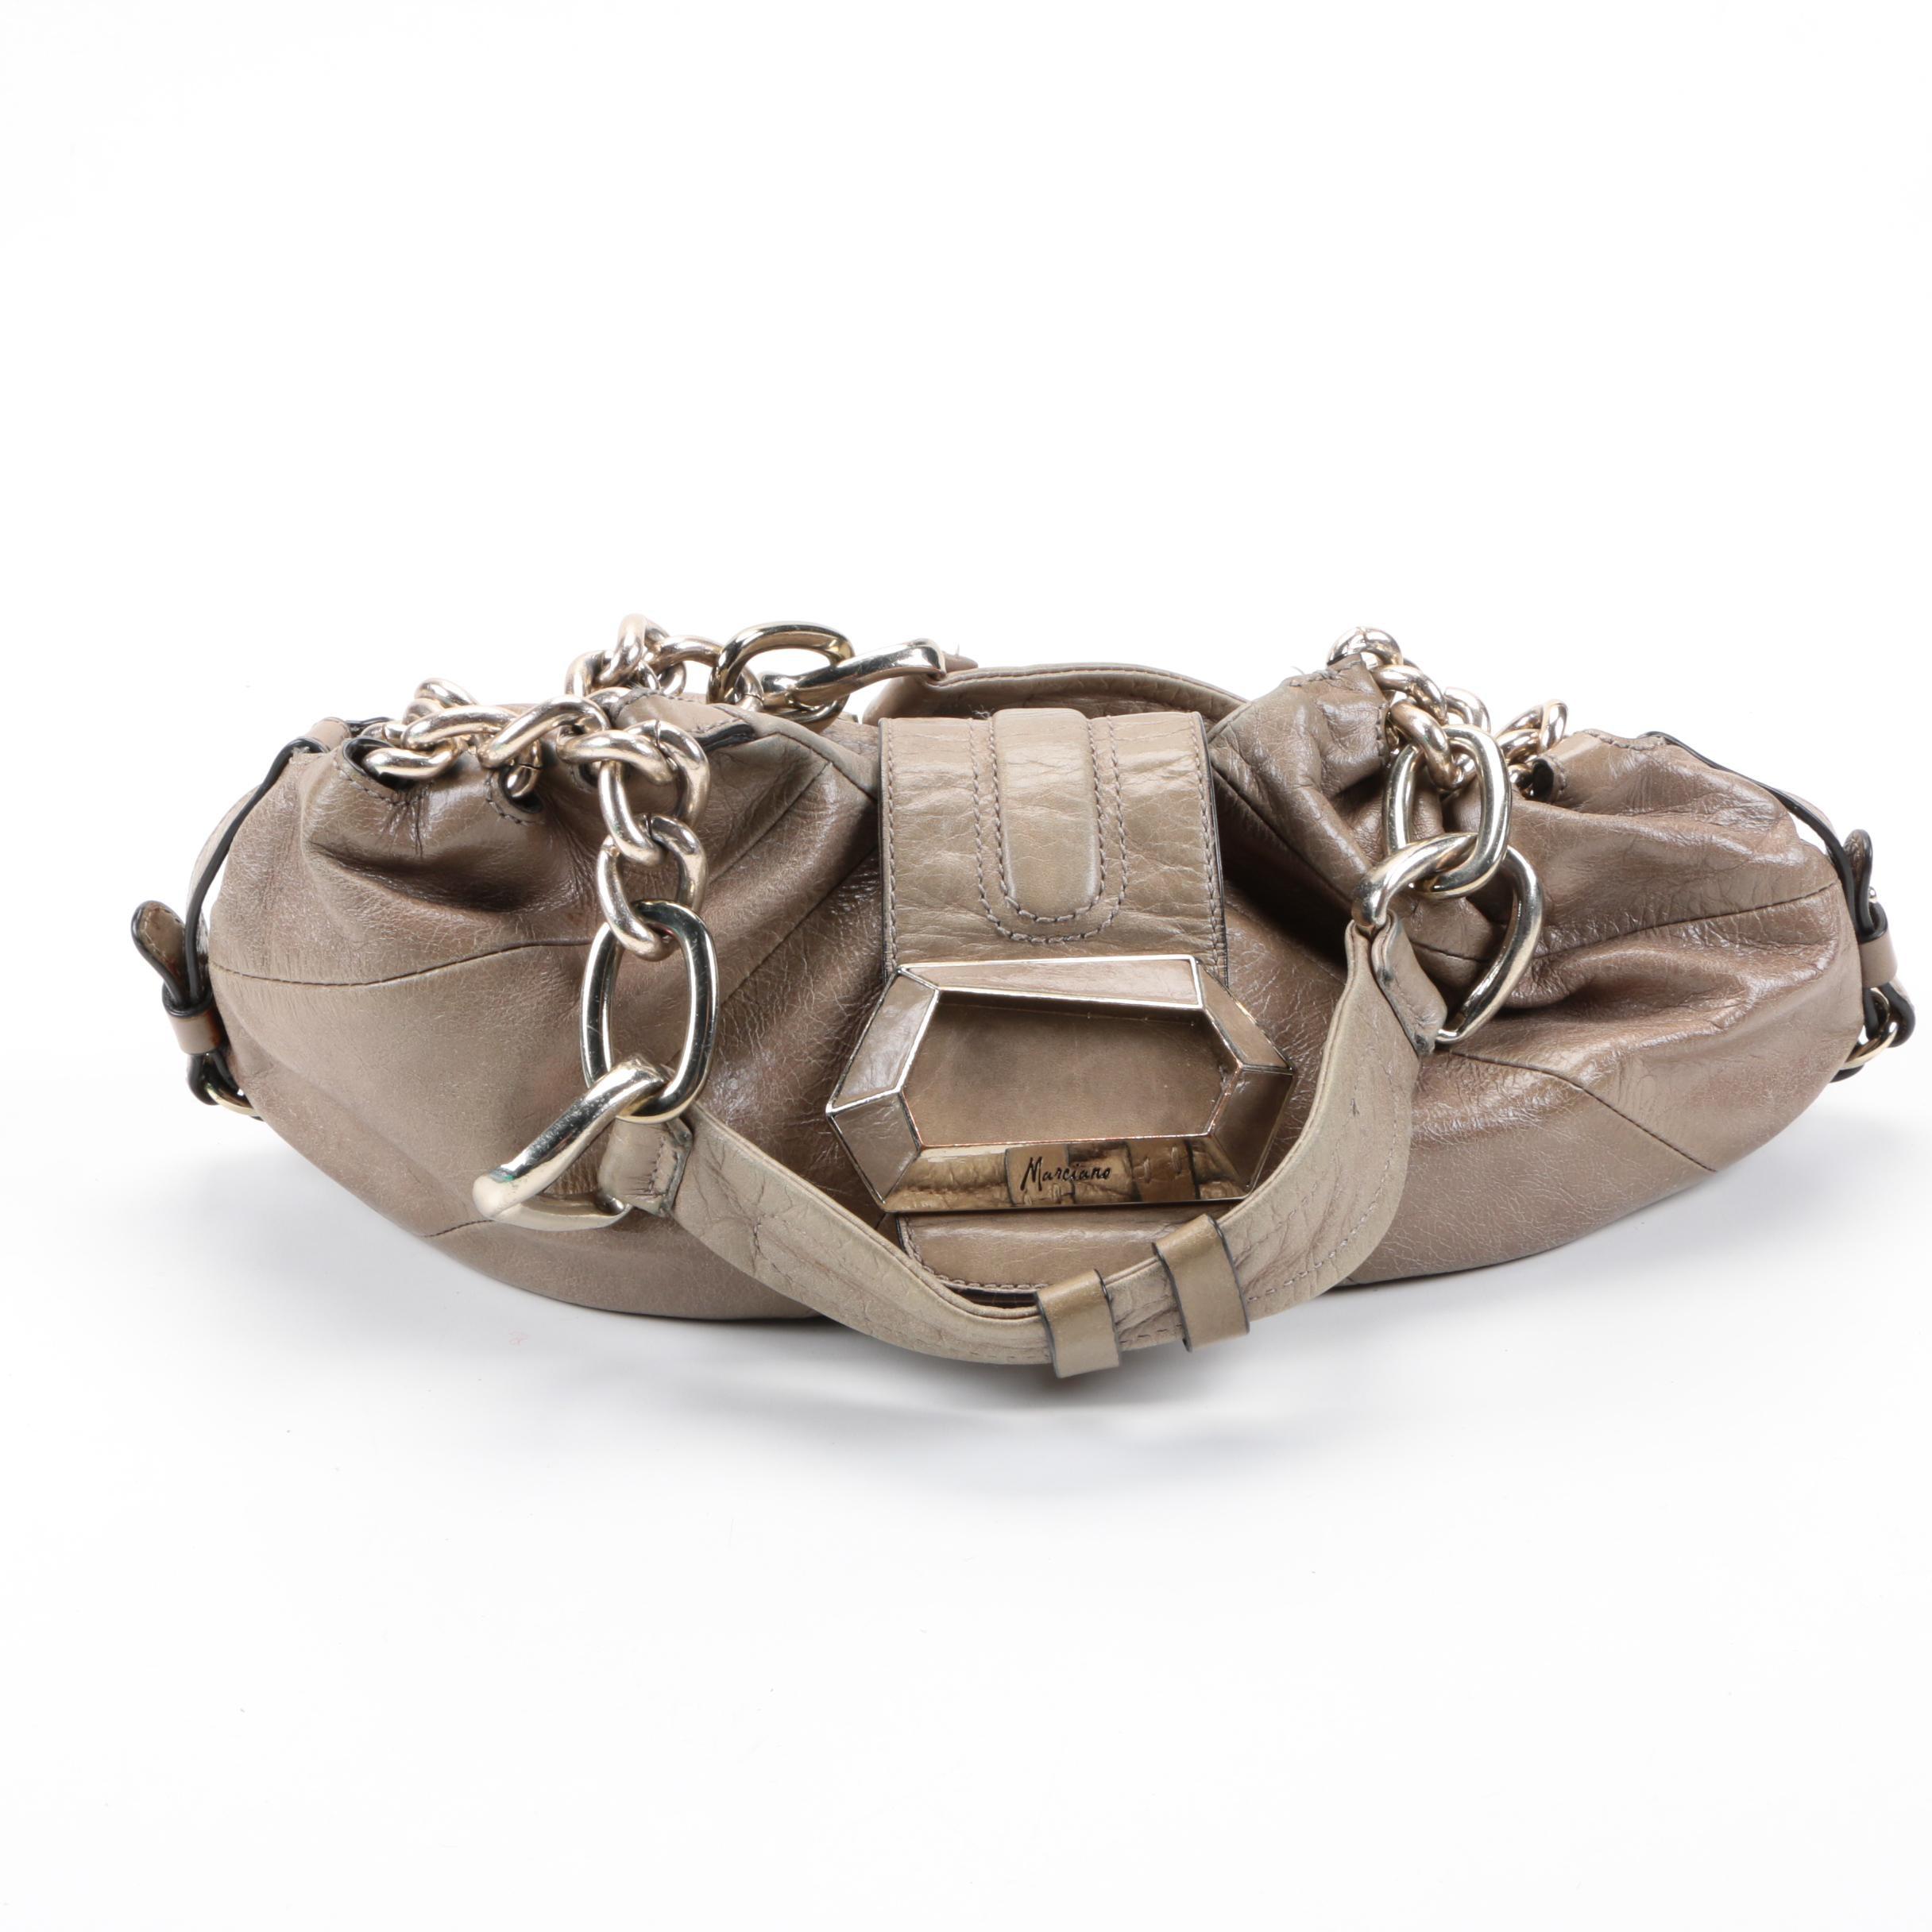 Marciano Grey Leather Handbag